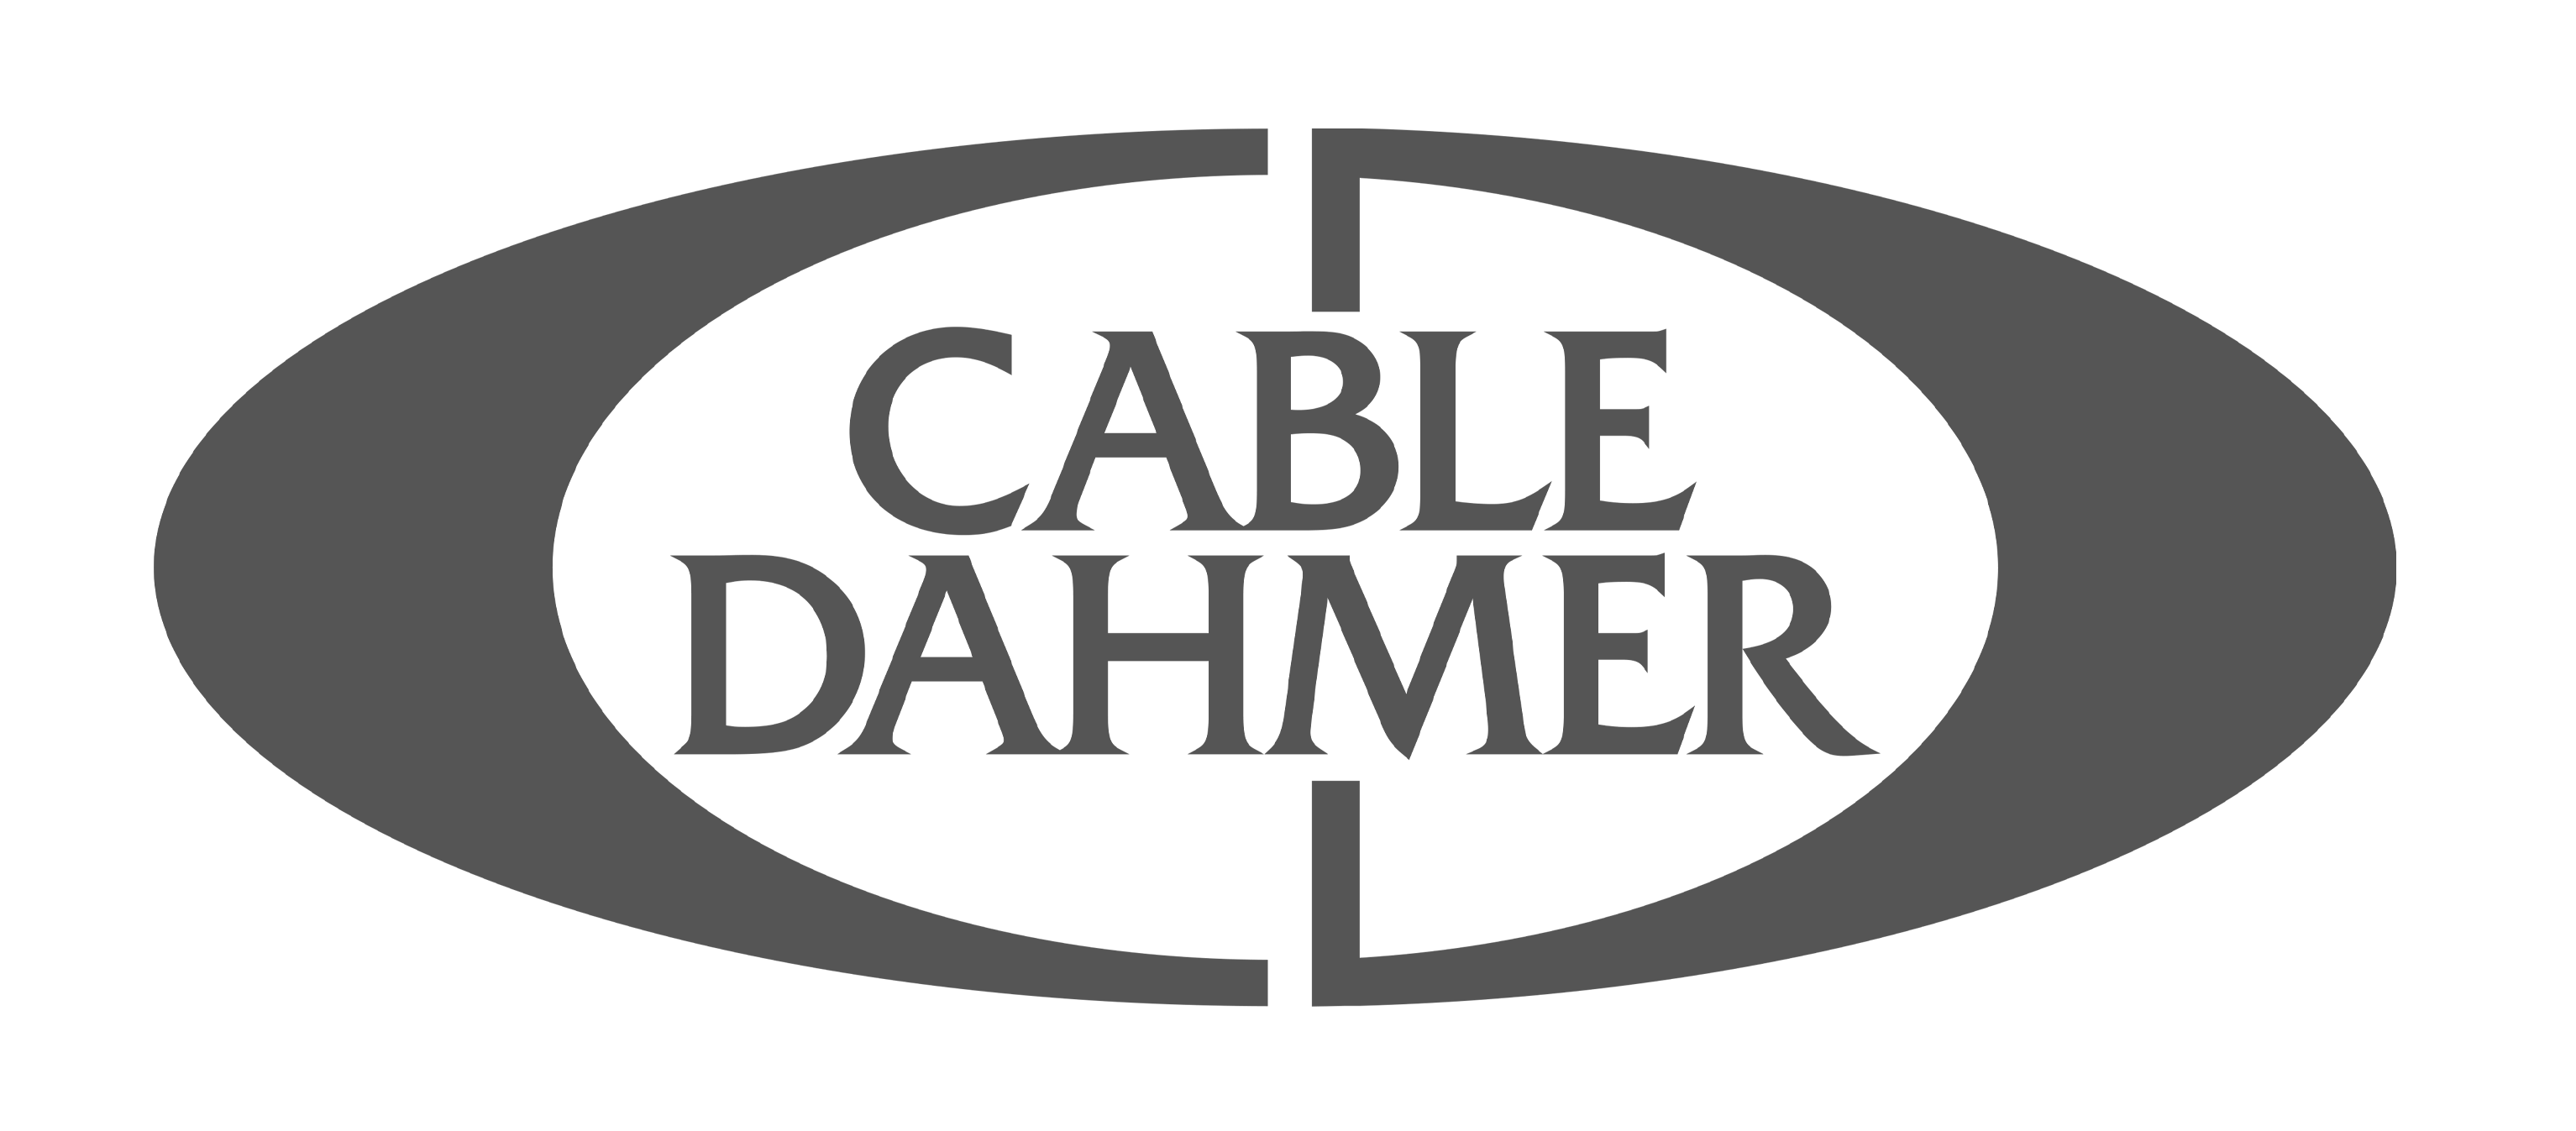 Cable Dahmer Buick GMC of Kansas City